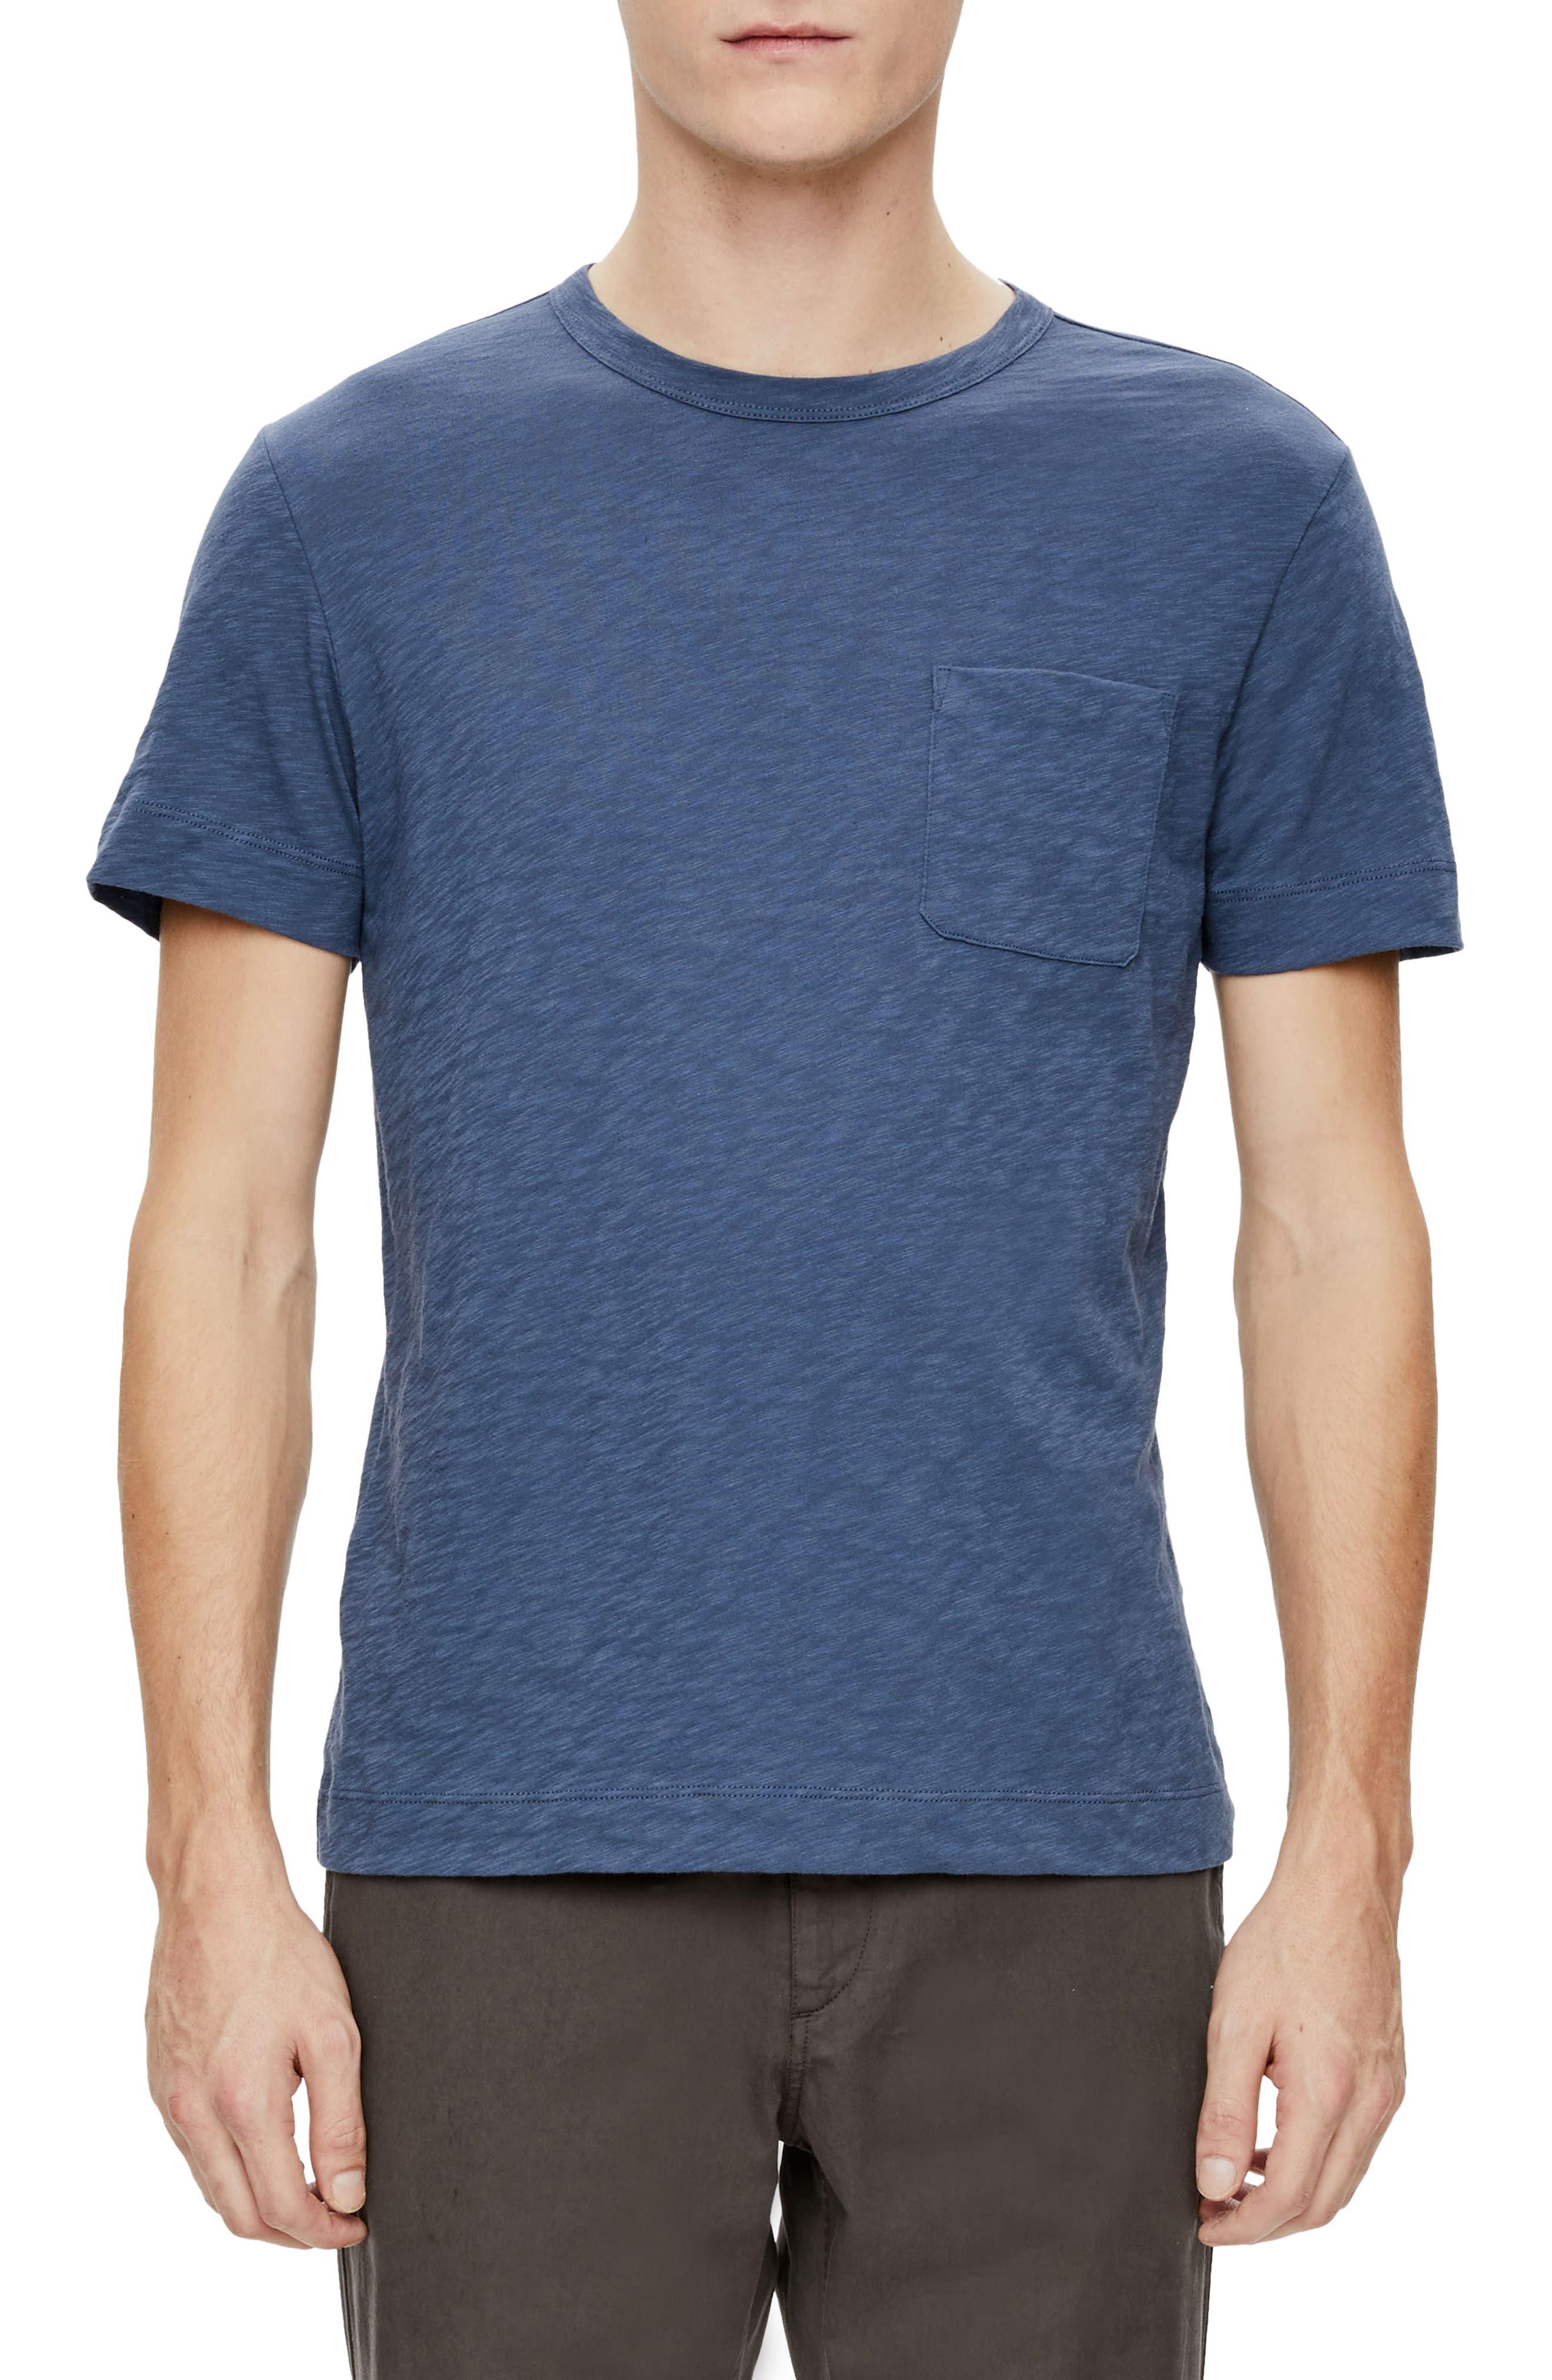 Theory Gaskell Nebulous Slub Pocket T-Shirt